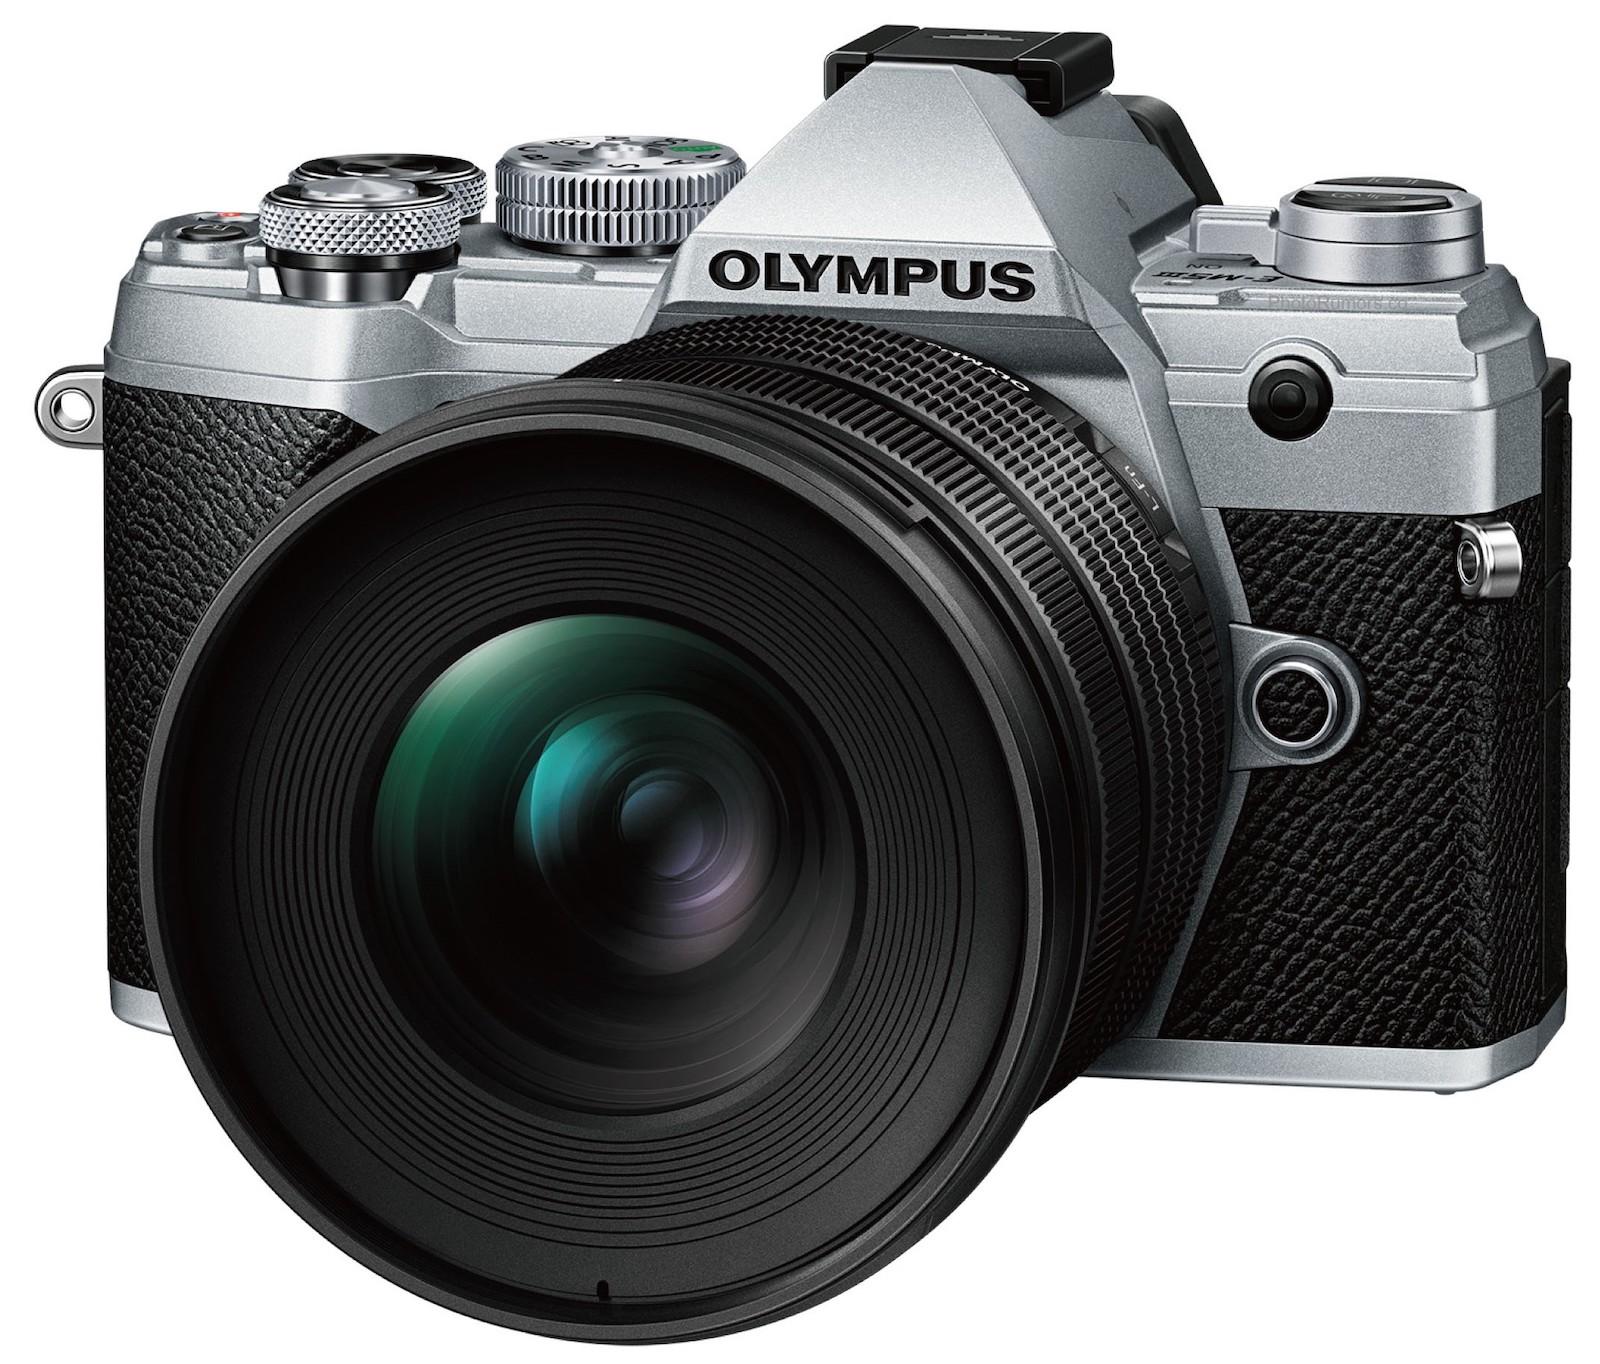 Объектив Olympus M.Zuiko Digital 8-25mm f/4 Pro с камерой Olympus